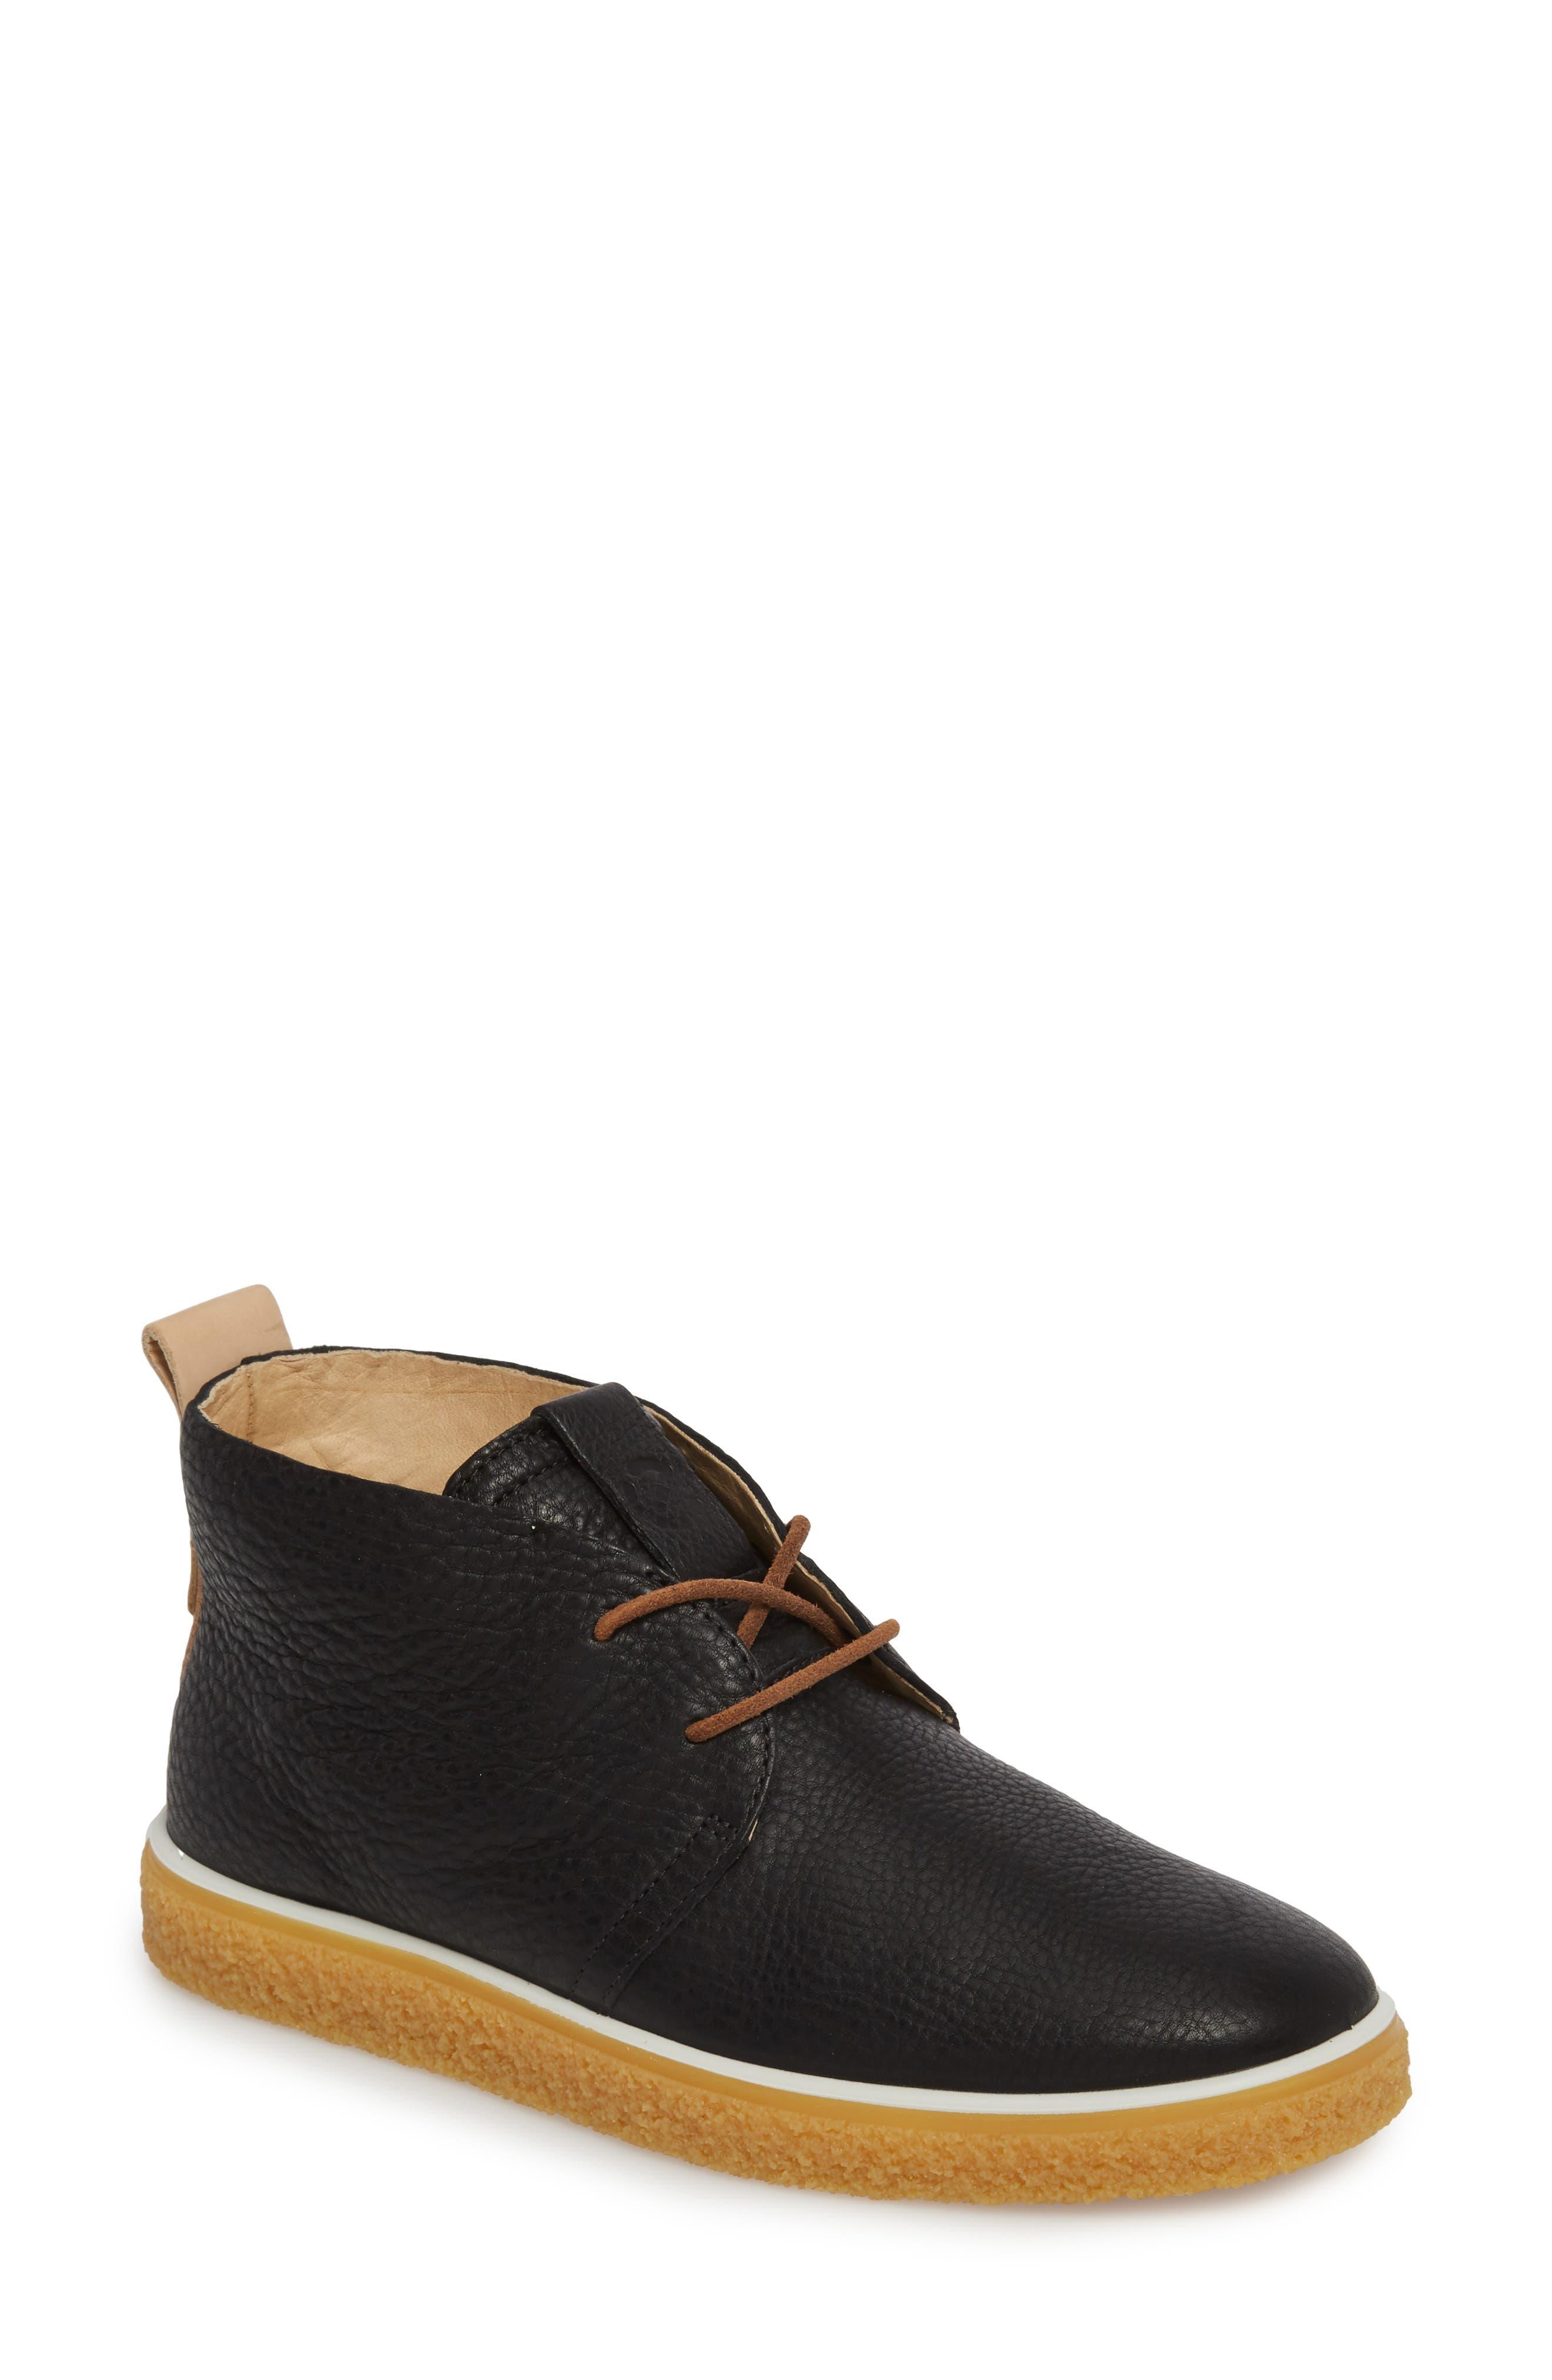 Crepetray Chukka Boot,                             Main thumbnail 1, color,                             Black Powder Leather